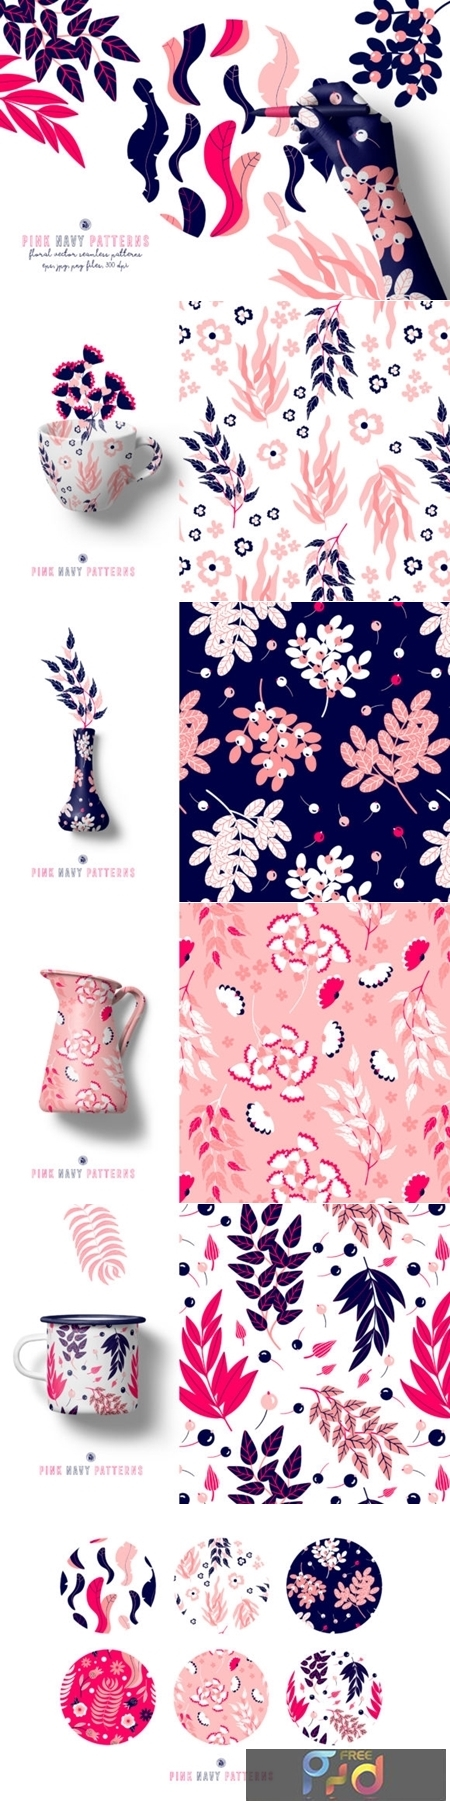 Pink Navy Vector Patterns 3719789 1